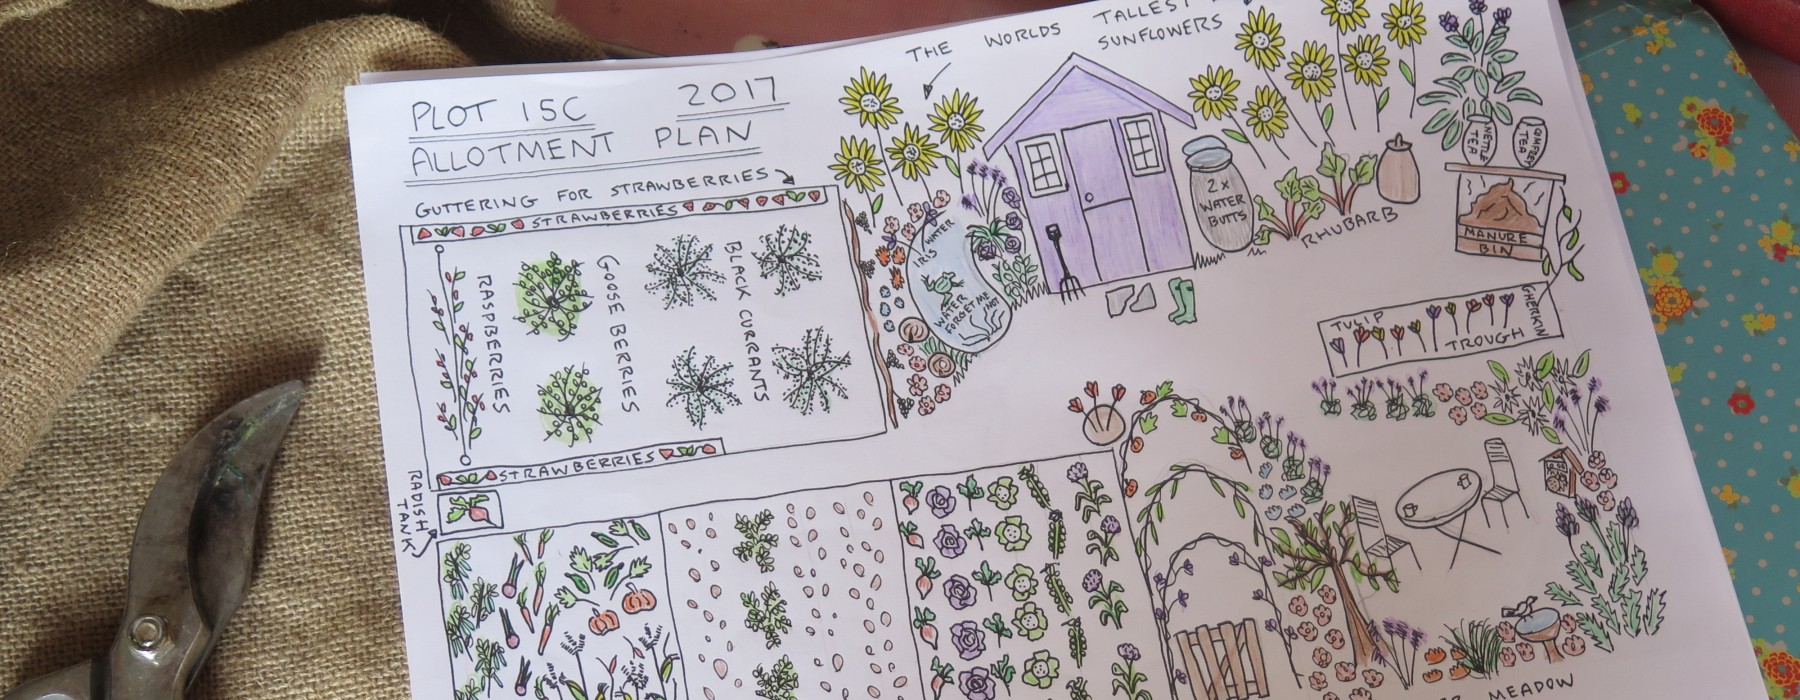 Plot 15c Plan 2017